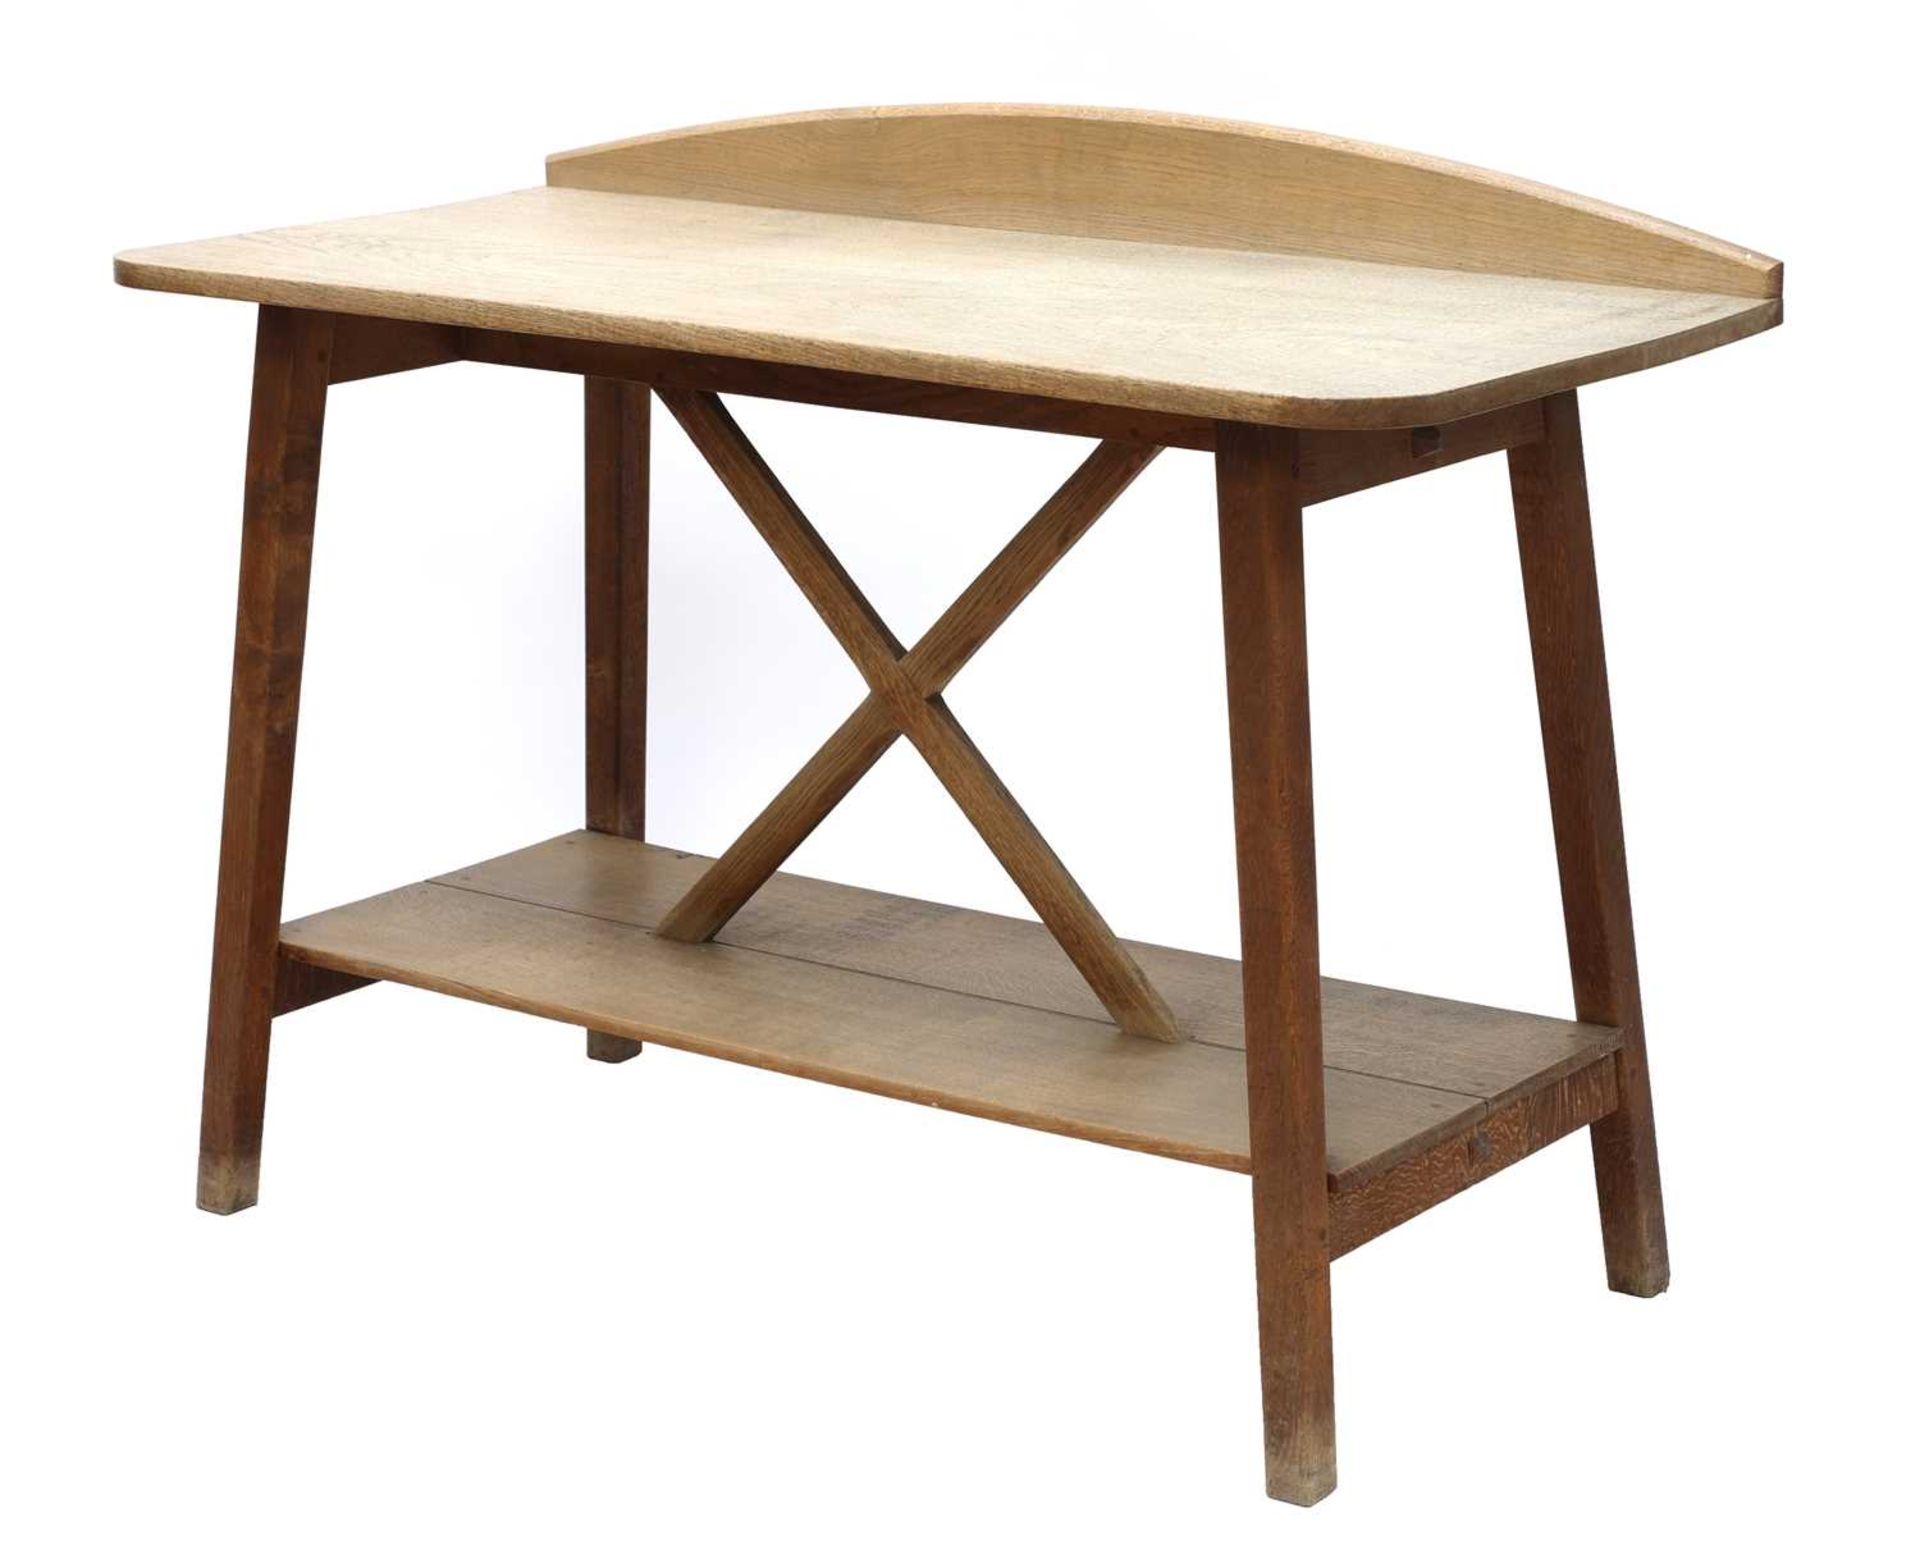 A Gordon Russell oak side table, - Image 2 of 3